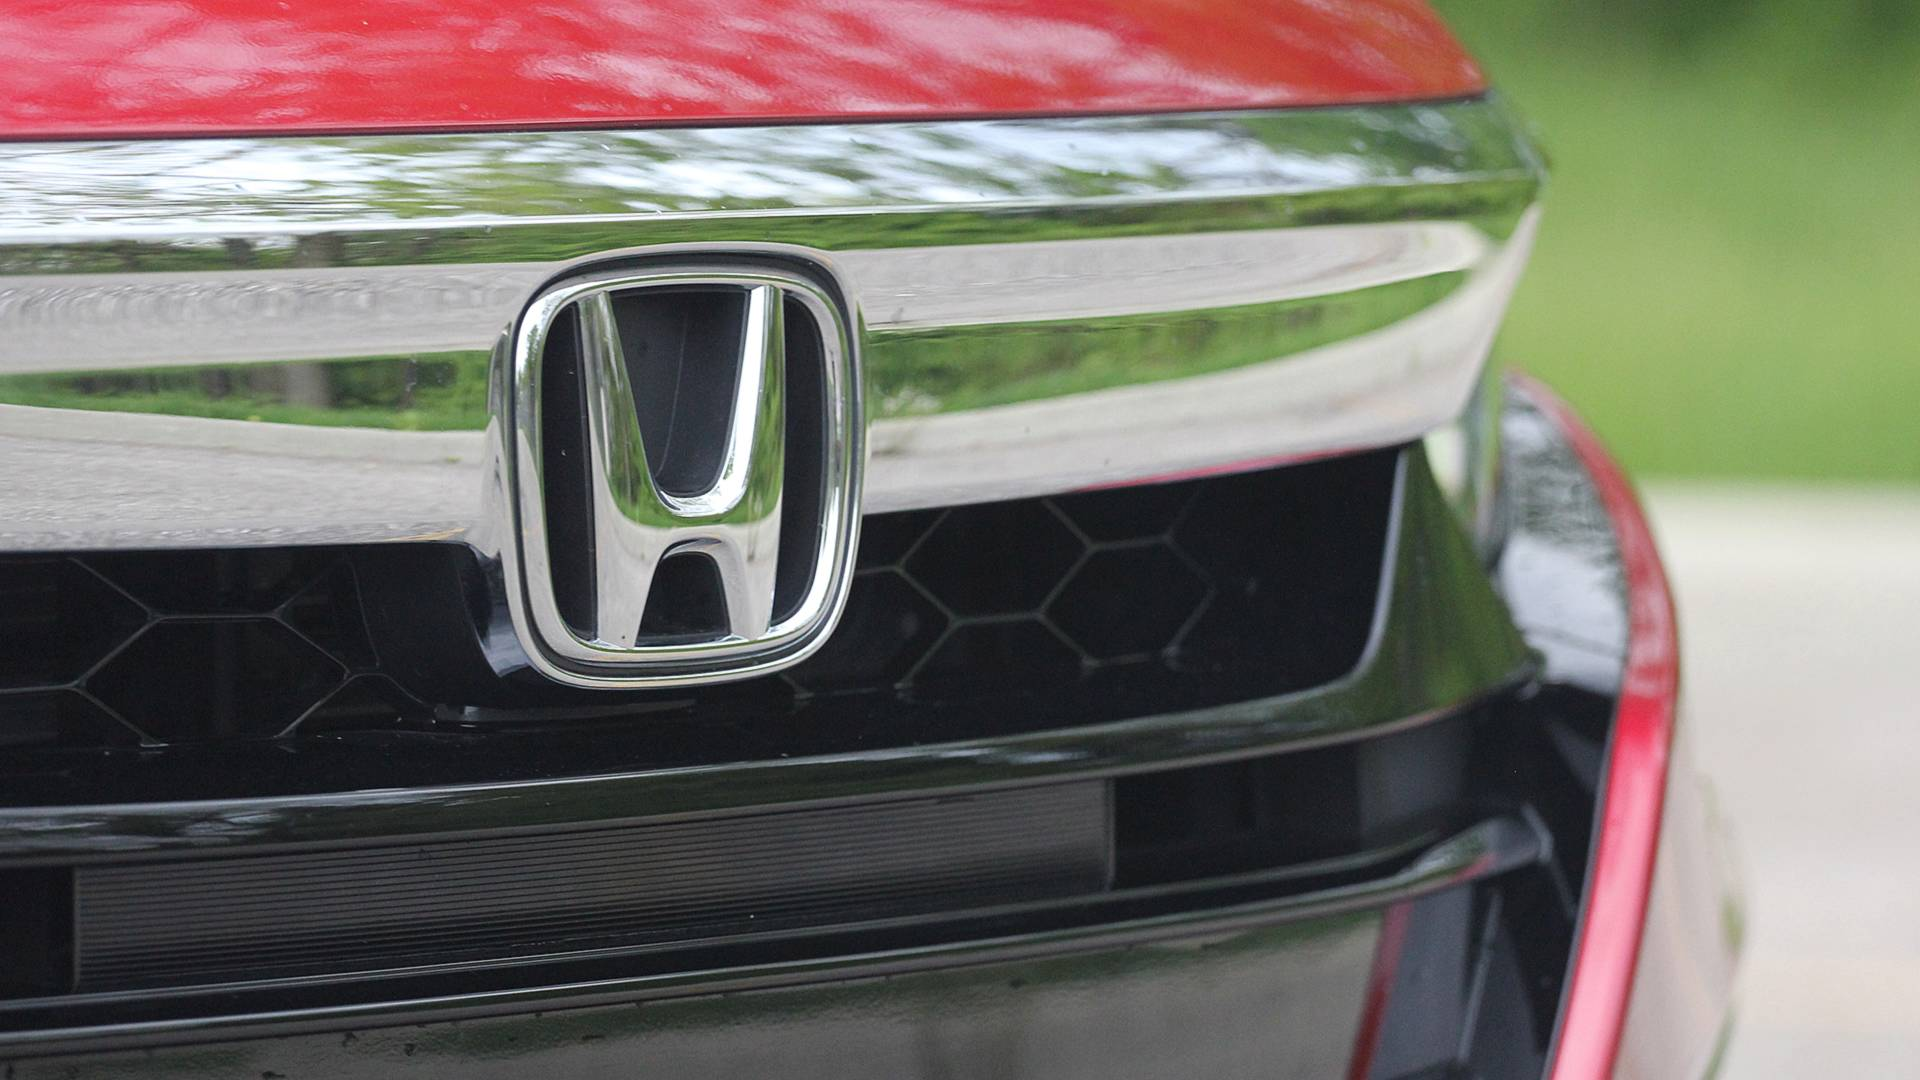 2018-honda-accord-hybrid-danh-gia-5.jpg